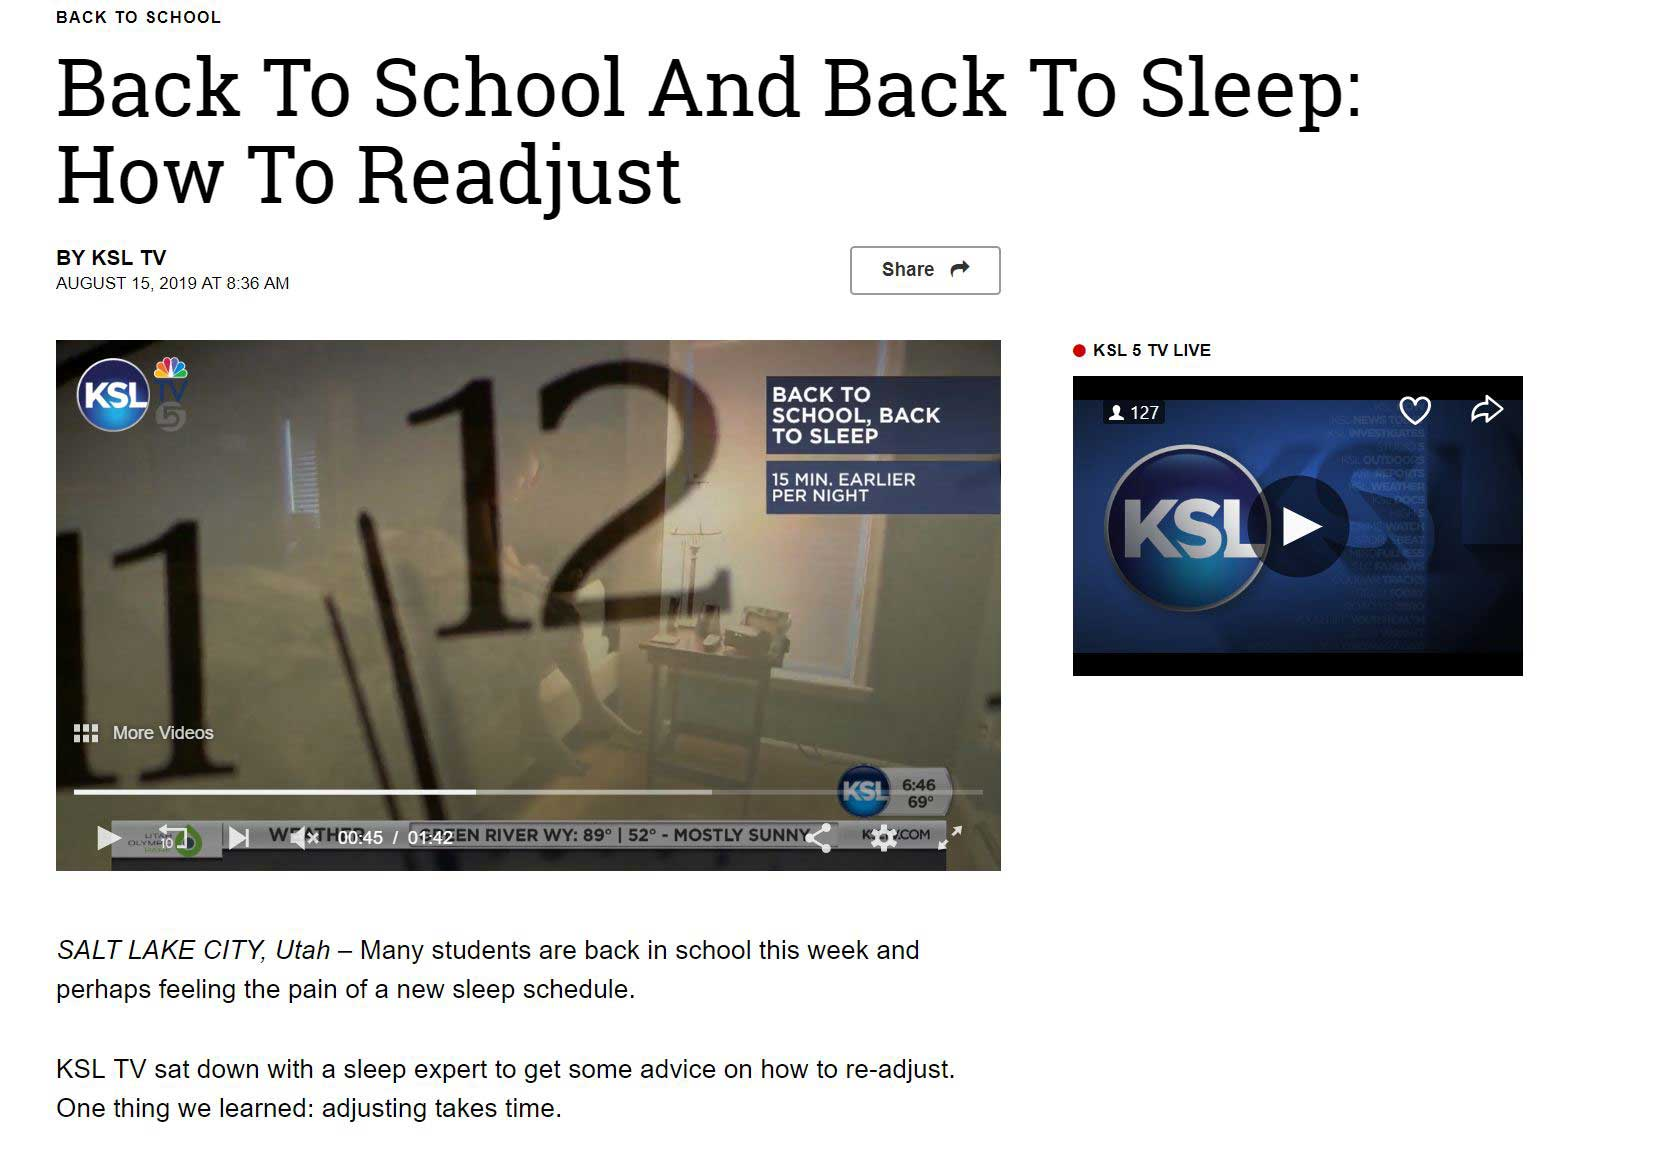 back-to-school-back-to-sleep-SM.jpg